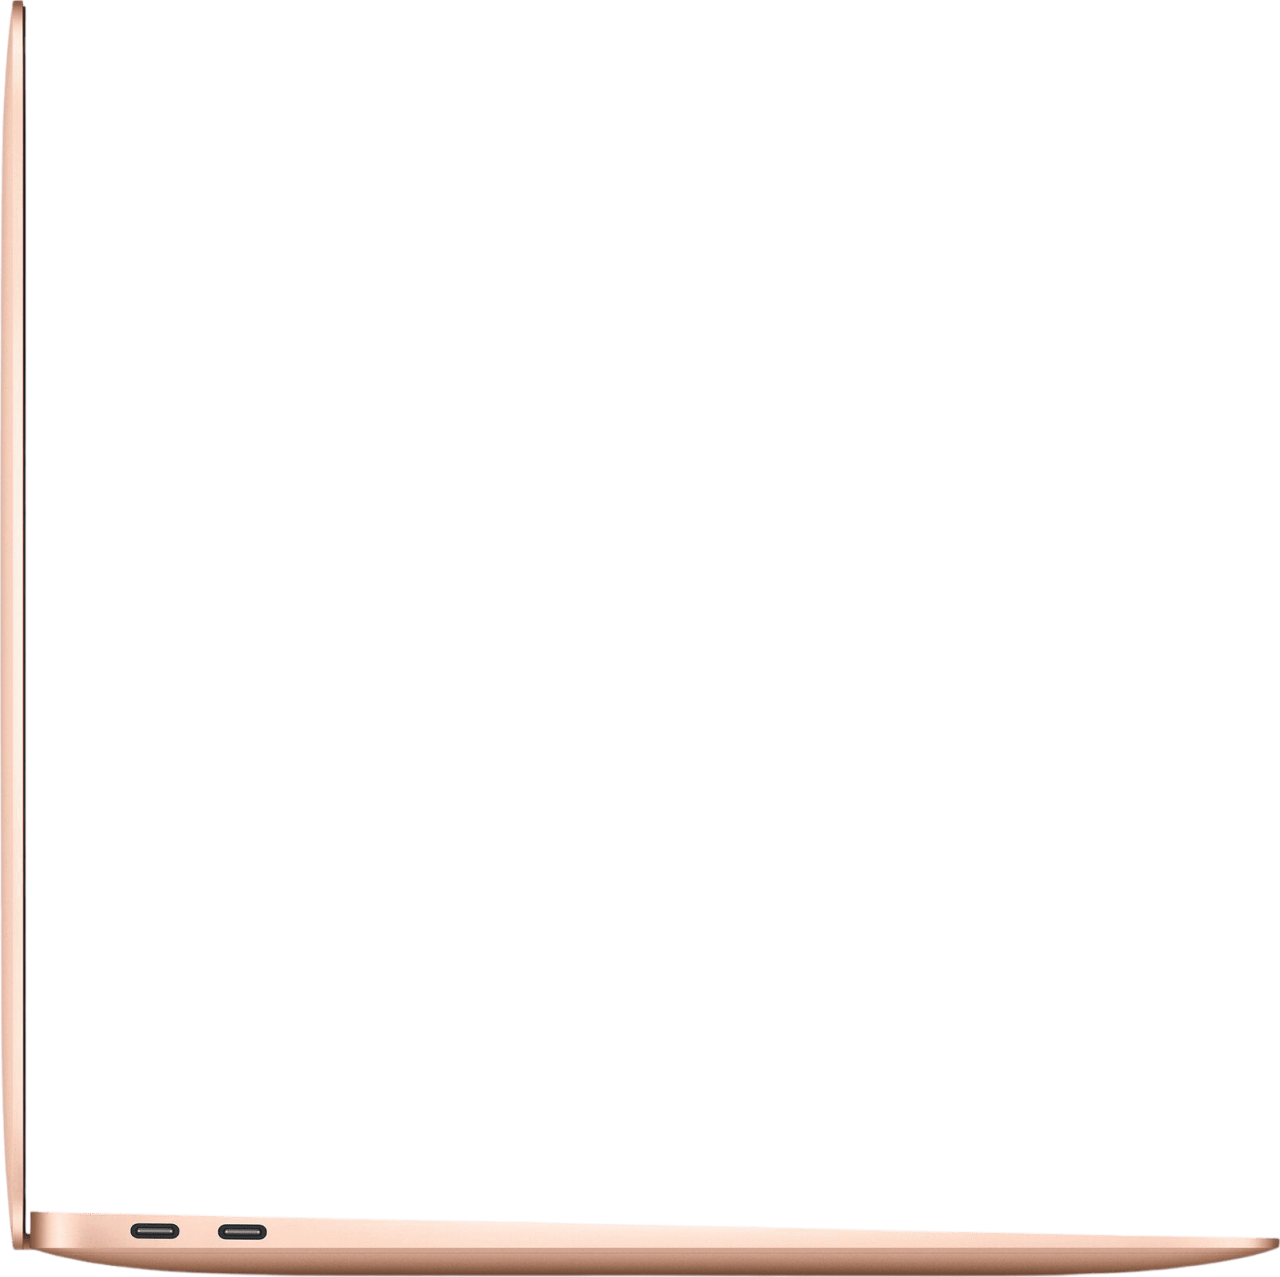 Gold Apple MacBook Air (Late 2020) - English (QWERTY) Laptop - Apple M1 - 16GB - 512GB SSD - Apple Integrated 8-core GPU.3